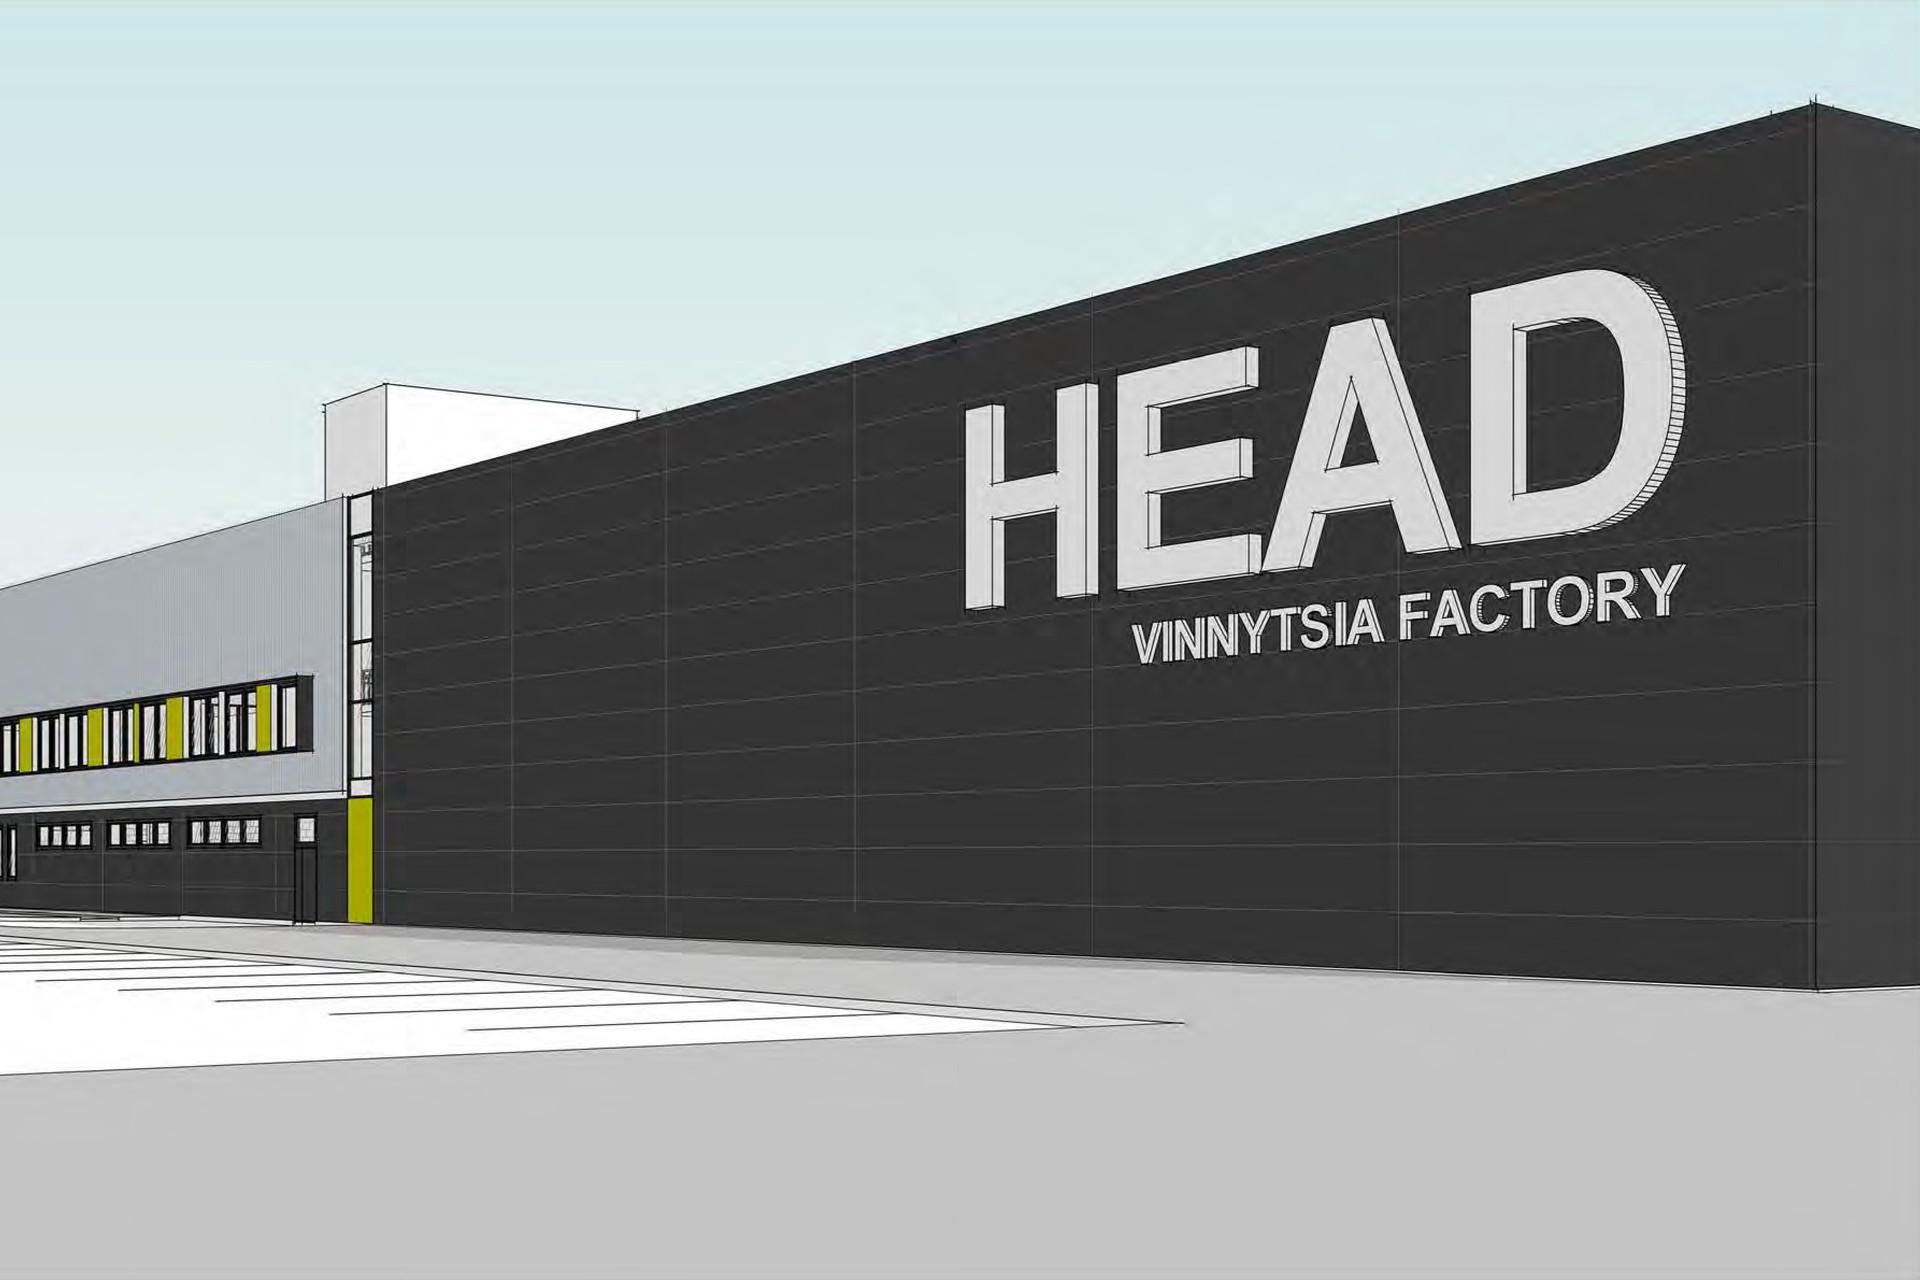 The third industrial park will appear in Vinnytsia